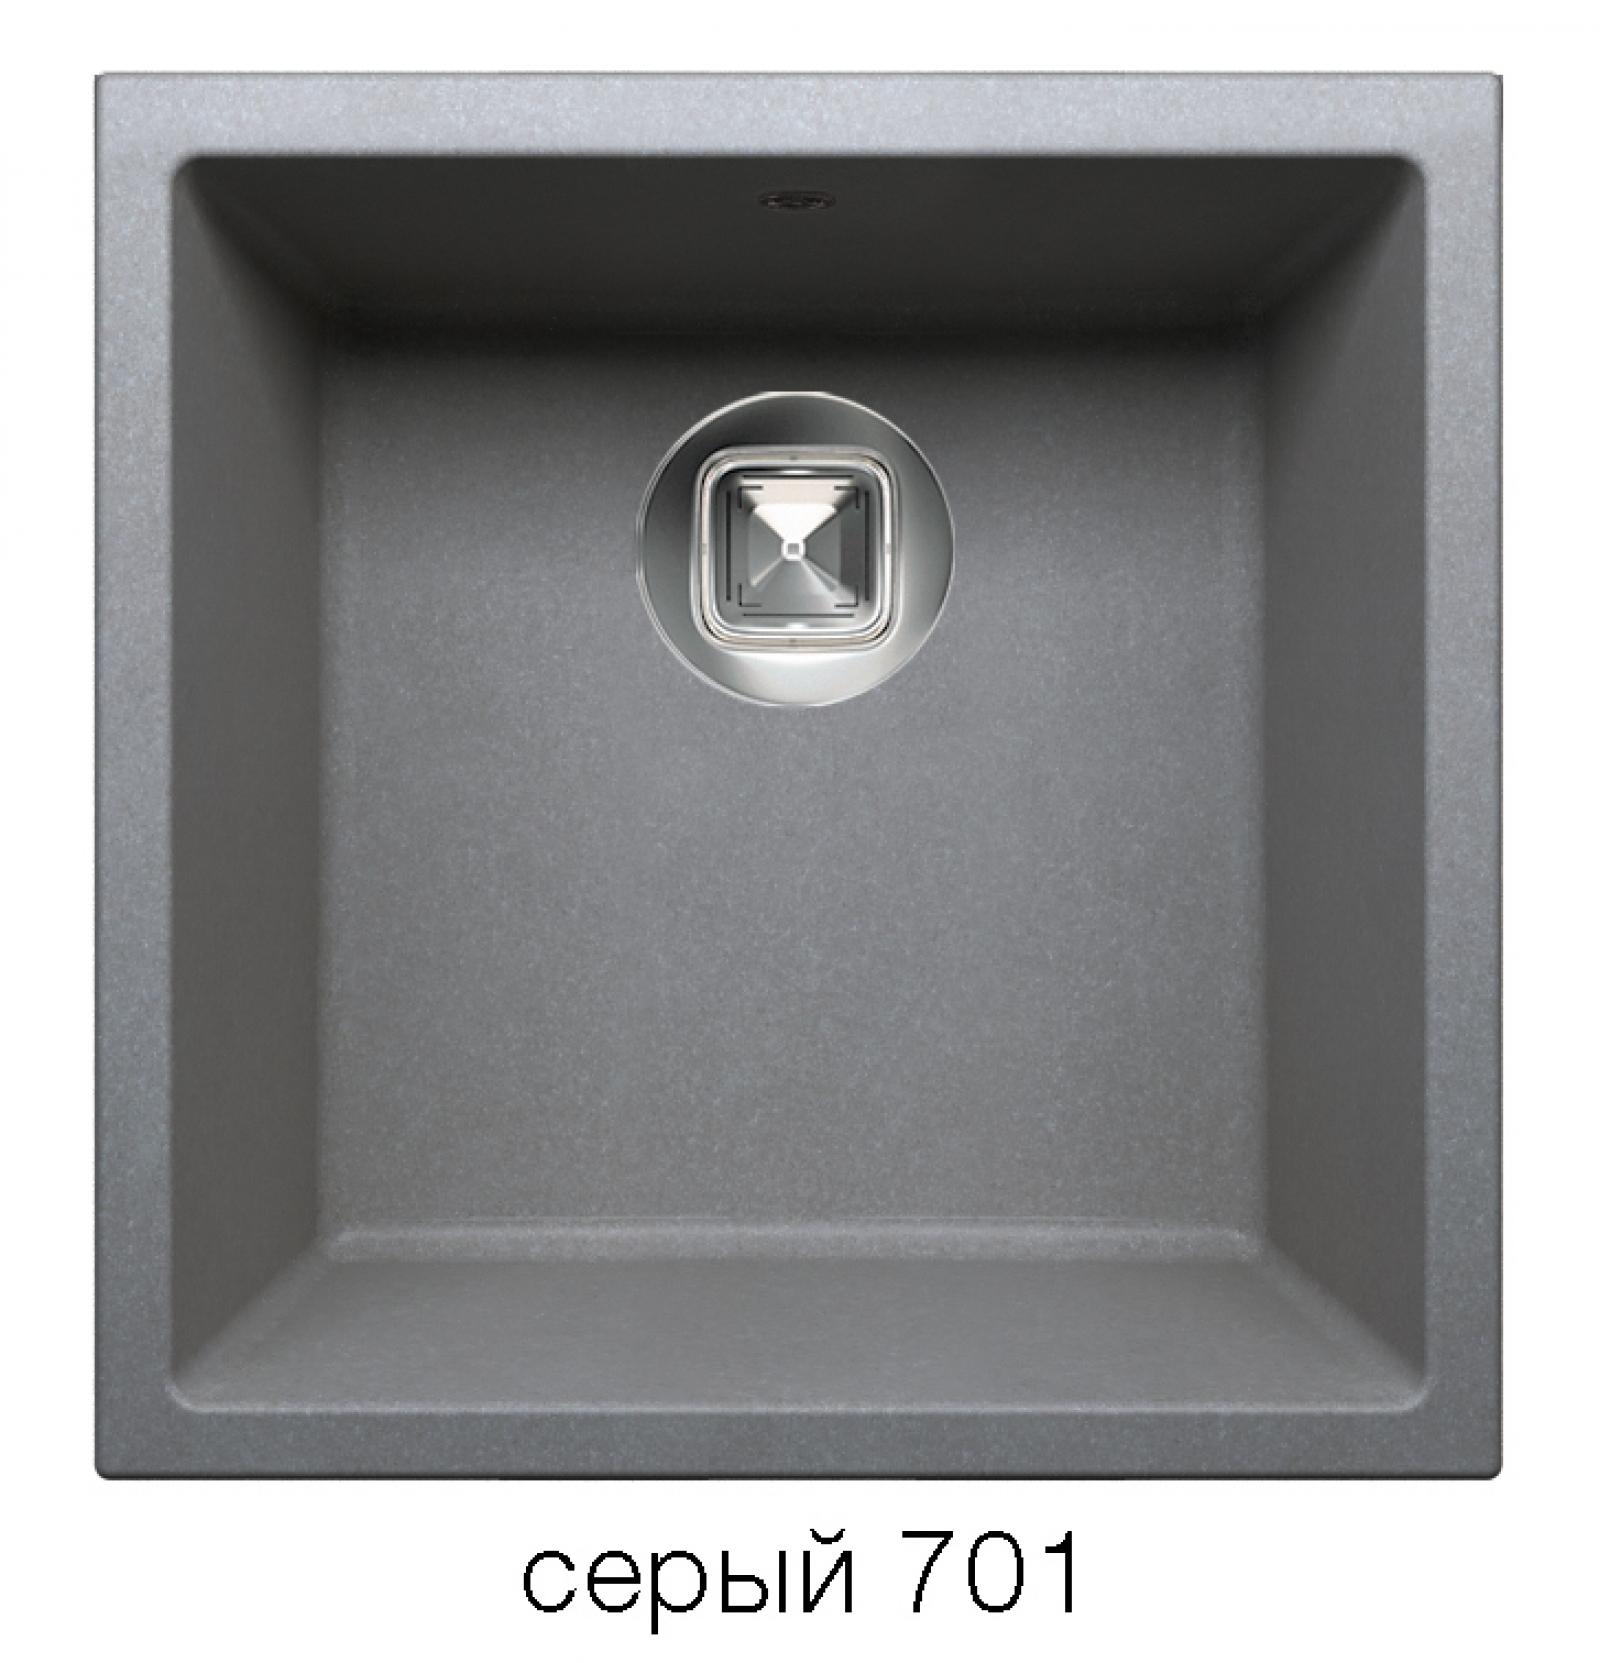 Мойка Tolero-R-128-701, цвет – серый